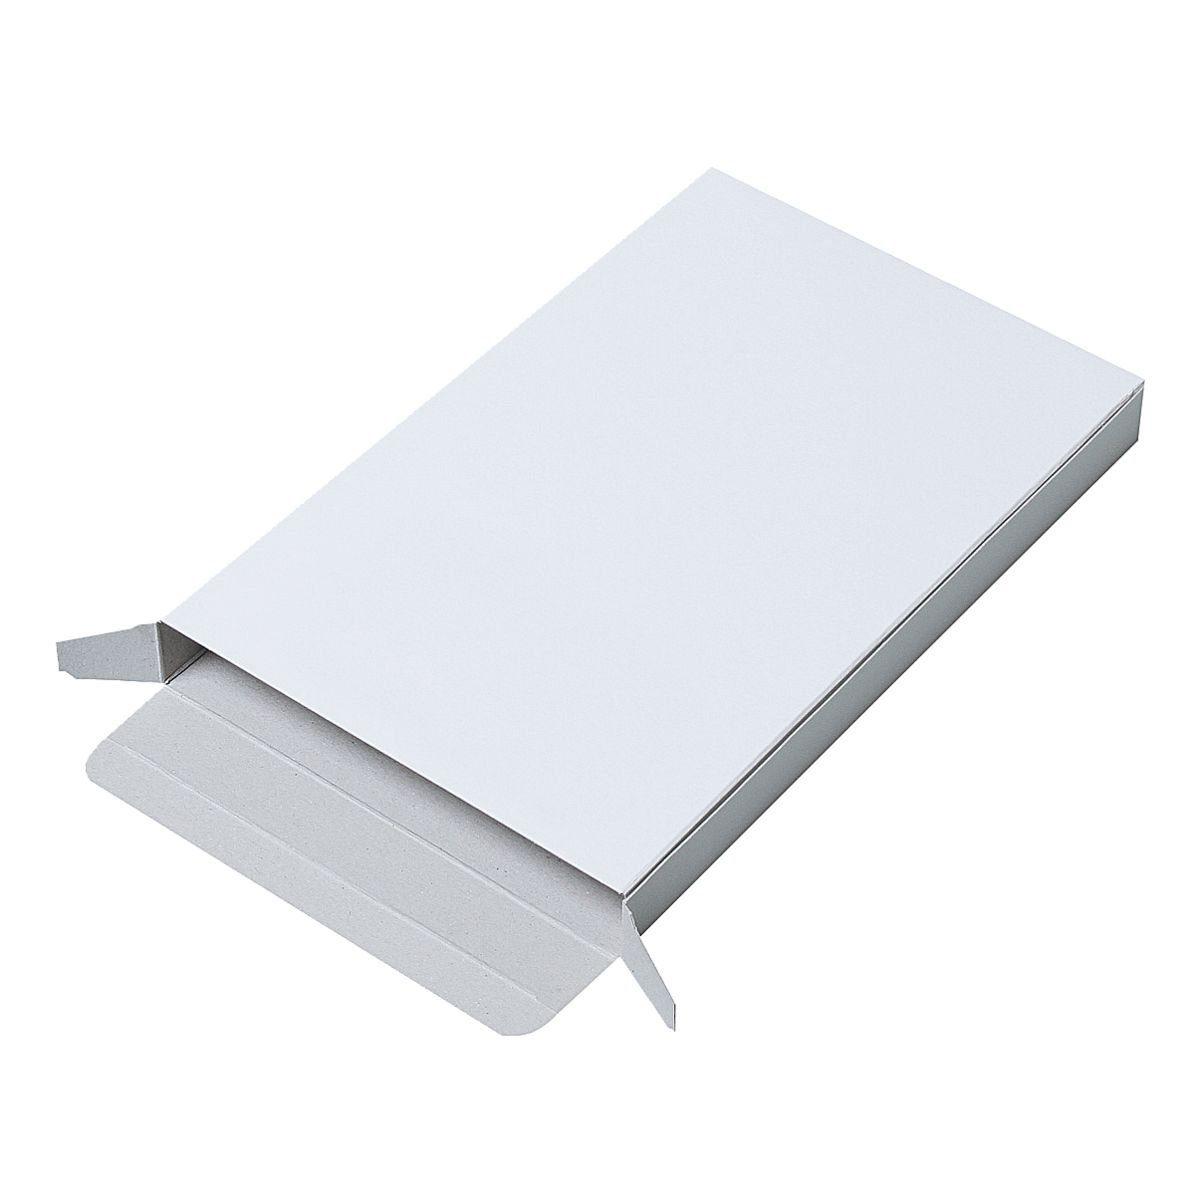 Versandkarton 30,5/22,0/2,5 cm - 20 Stück